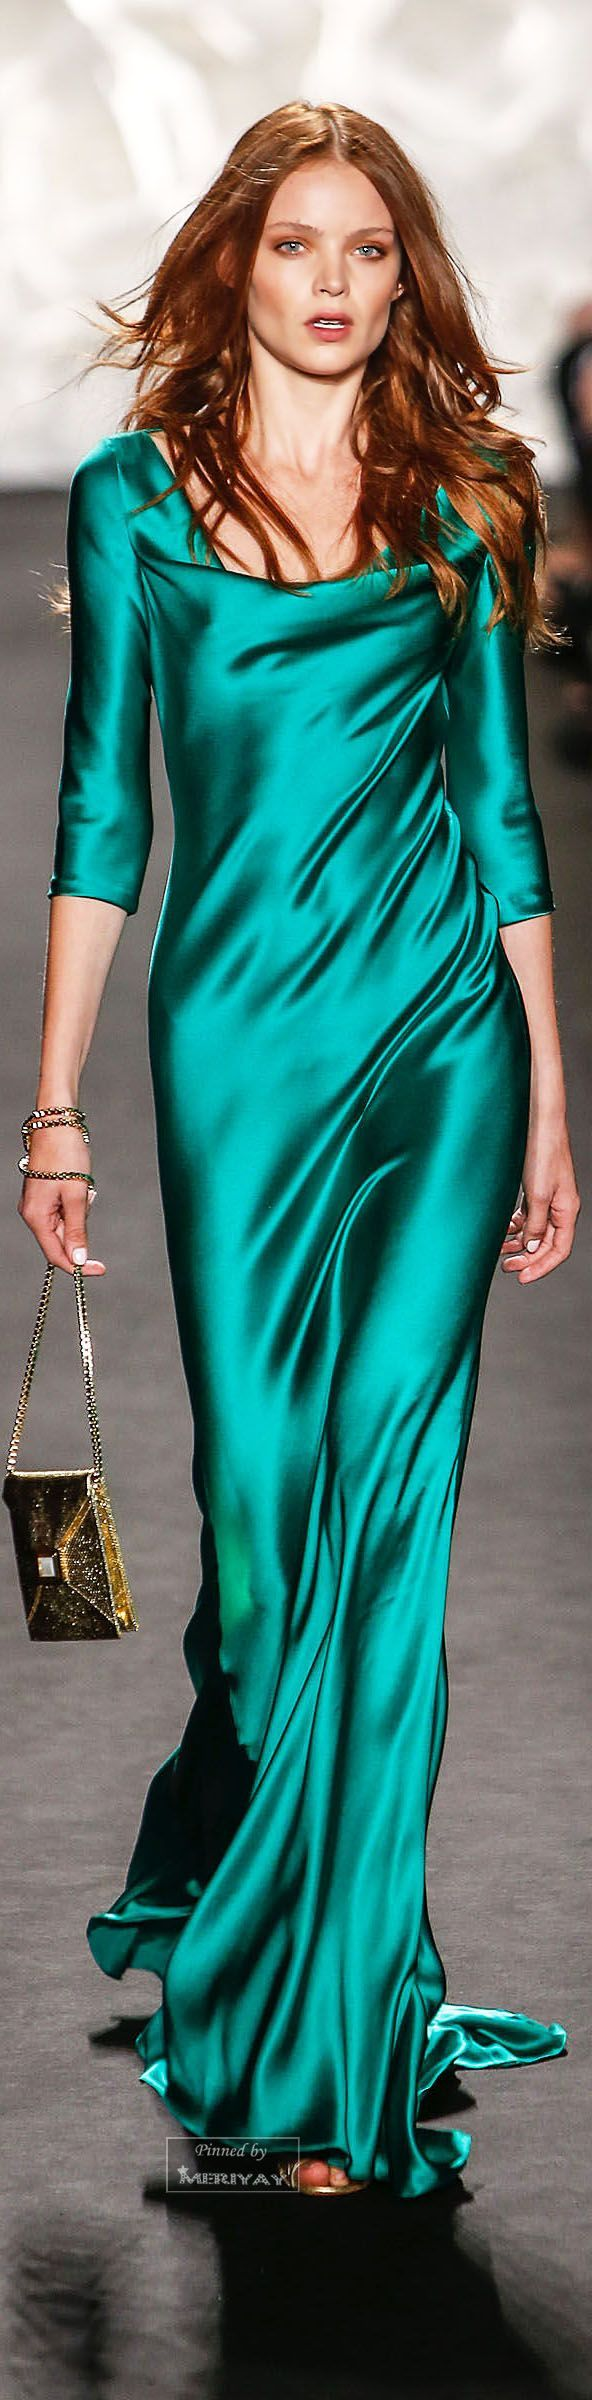 Sensational And Sensual Satin Dresses To Make You Shimmer | Satin ...